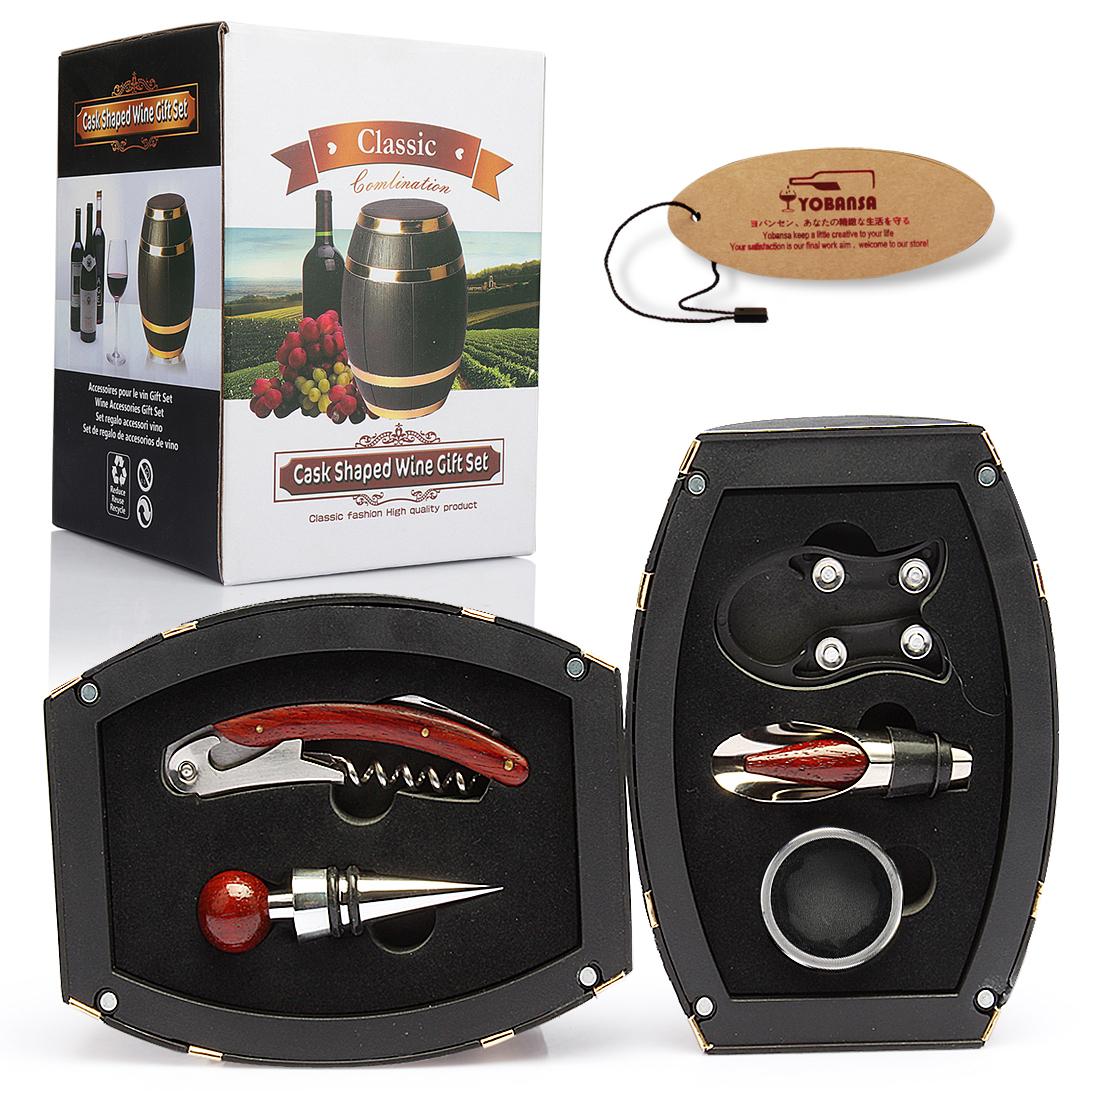 SHUNSTONE Hot Sale Wine Barrel Shaped Wine Accessories Gift Set Wine Opener Corkscrew Featured Image